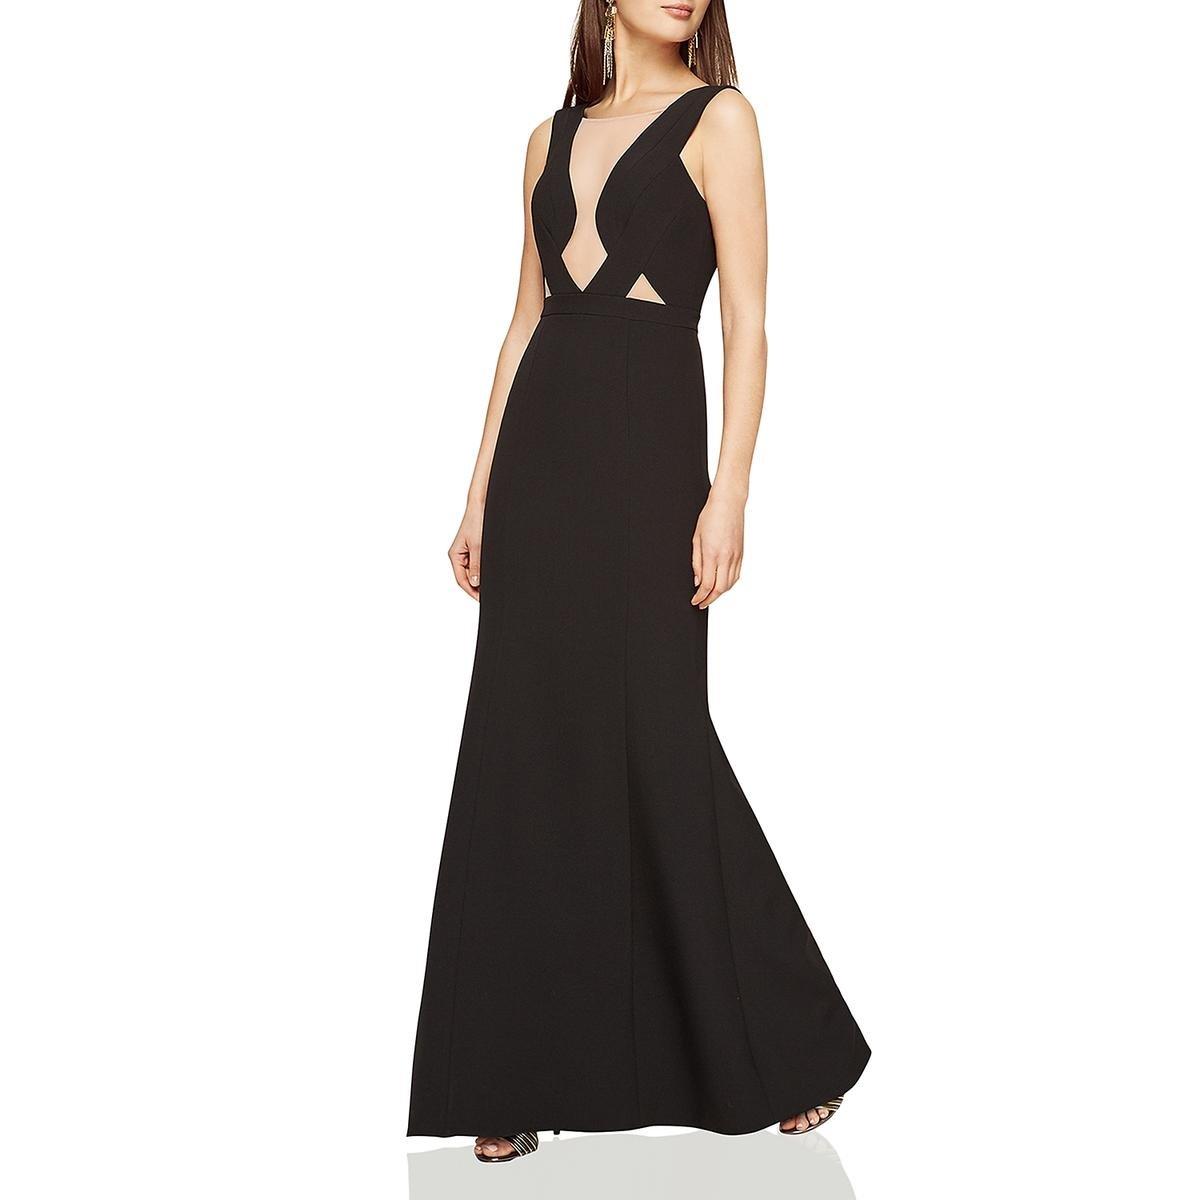 7ff6a180835 Amazon.com  BCBG Max Azria Womens Lulu Woven Sleeveless Formal Dress   Clothing